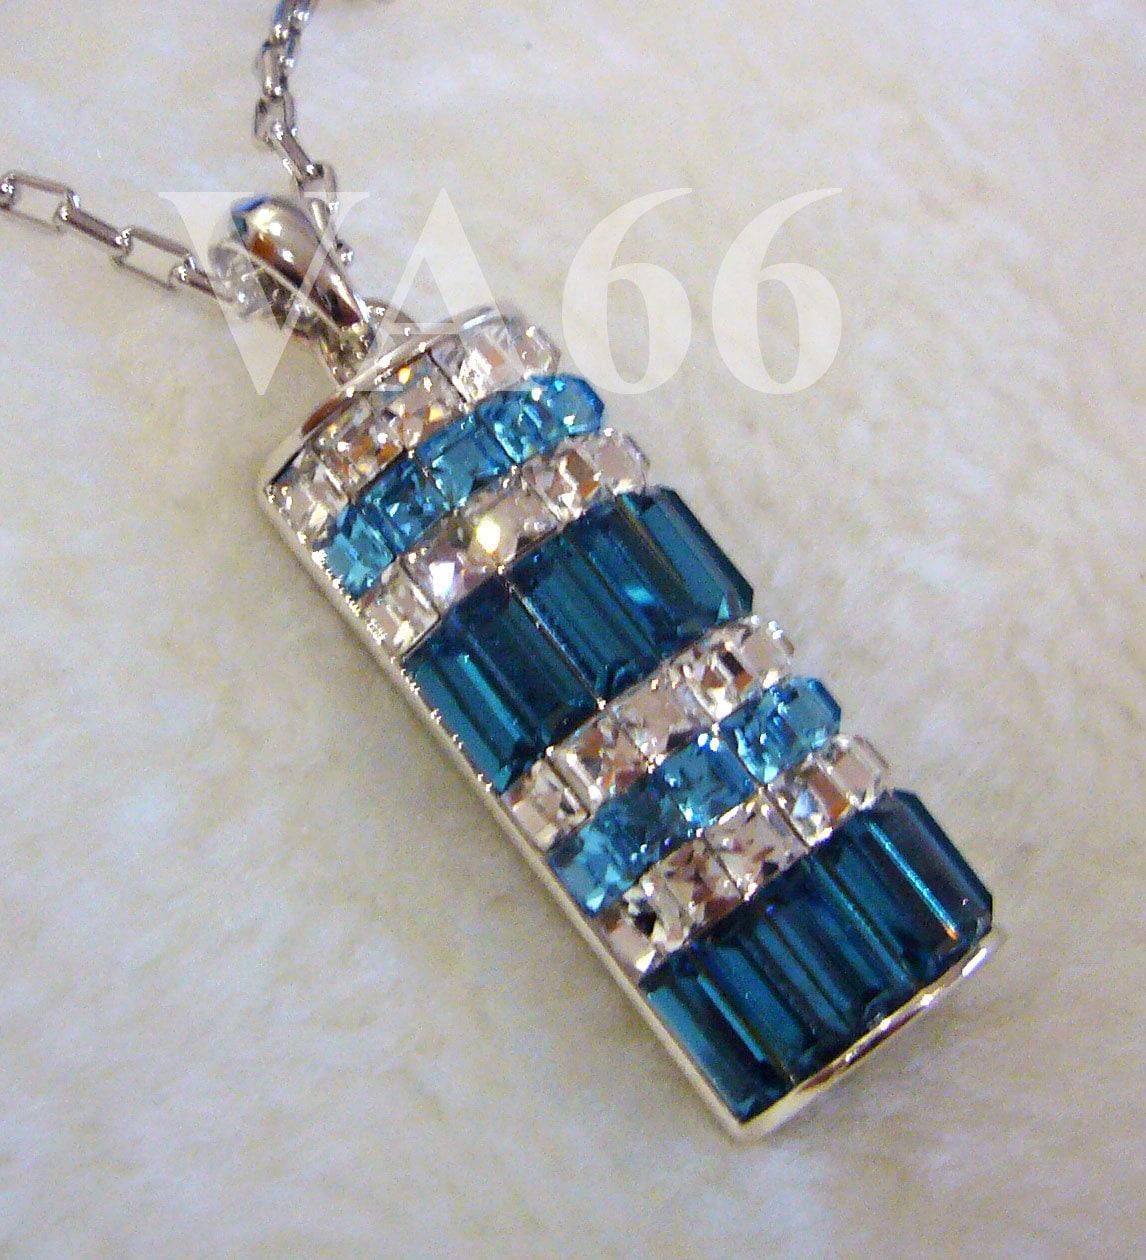 18KGP Rhodium Plated Diamond Swarovski Crystal Pendant Necklace Something  Blue Teal Bridal, Bridesmaids, Flower Girl, Christmas, MOB